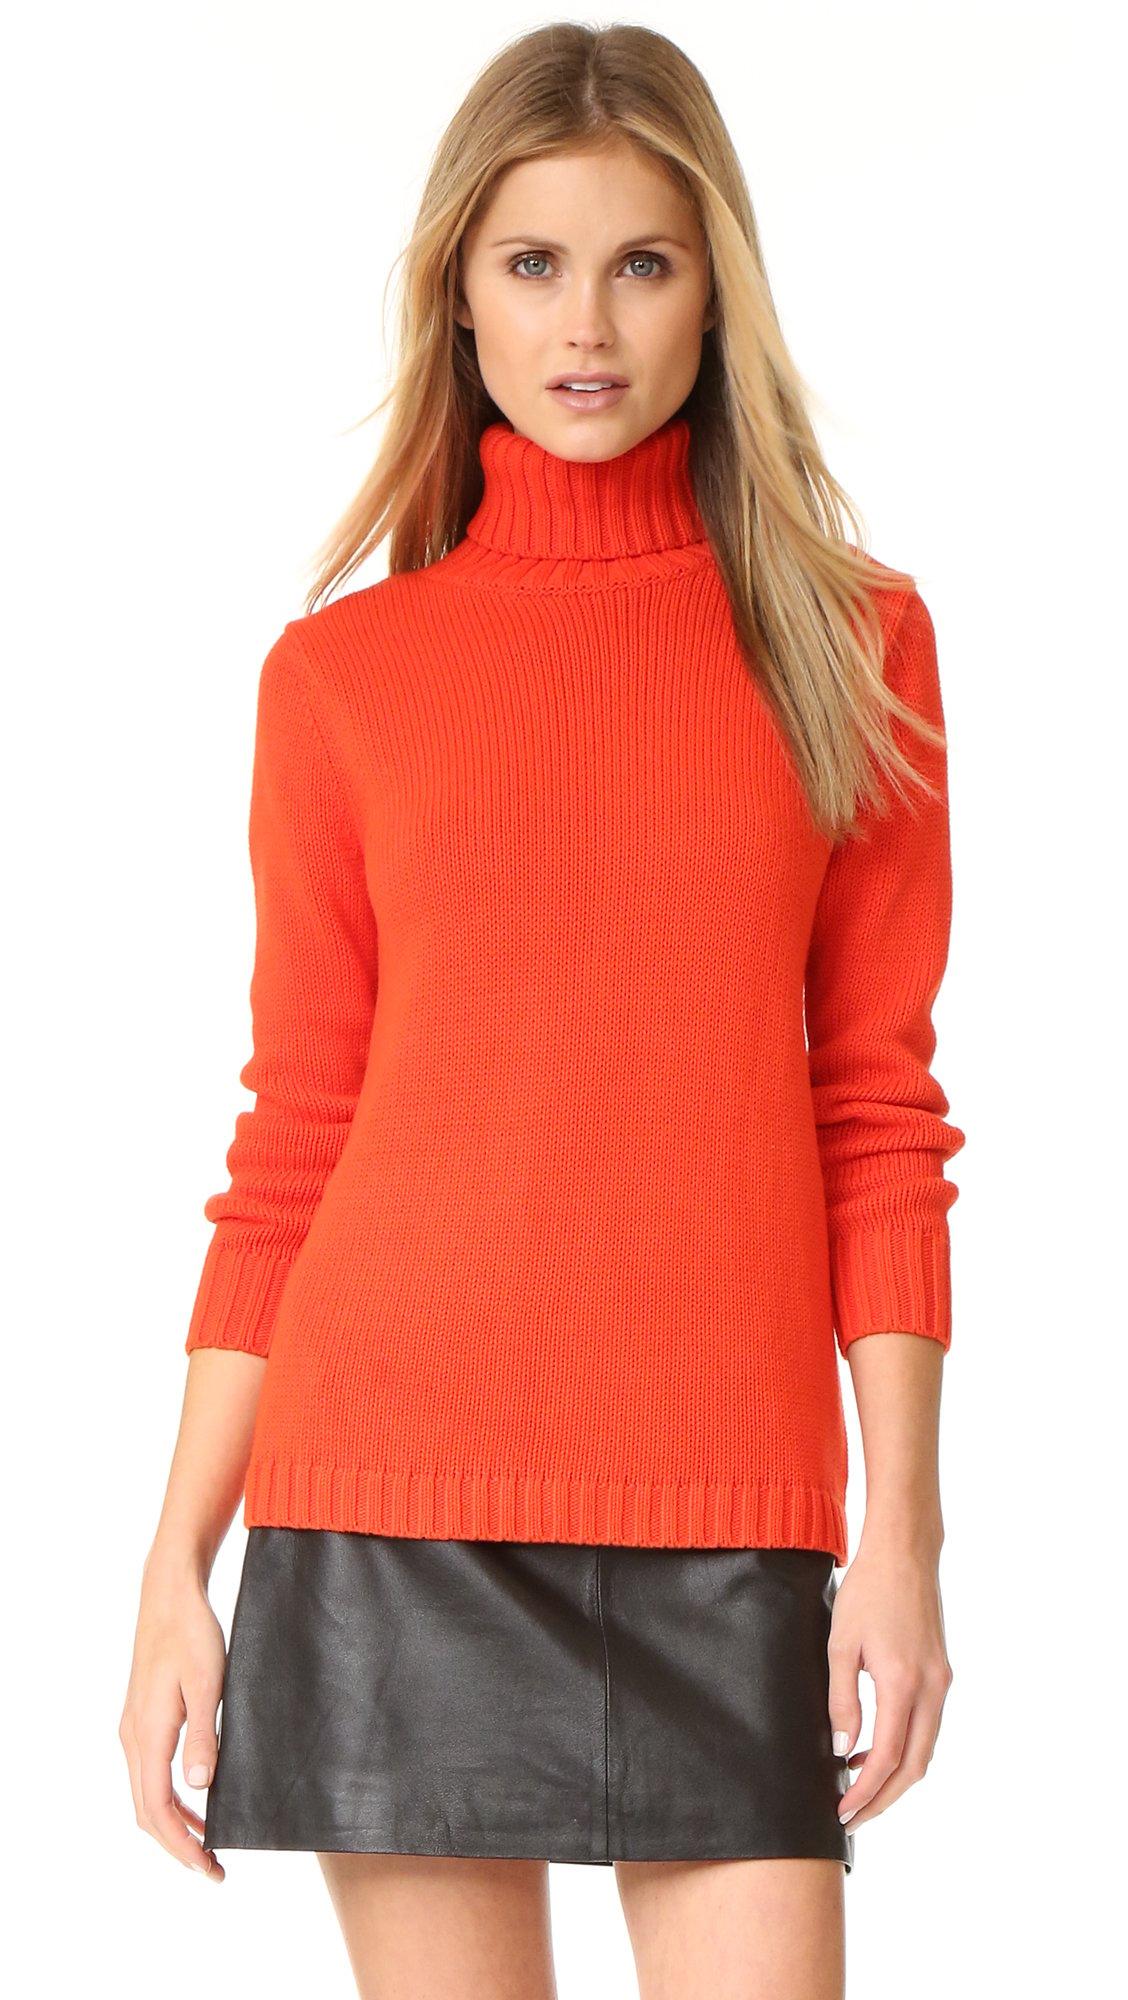 Lyst - 525 america Turtleneck Sweater in Black